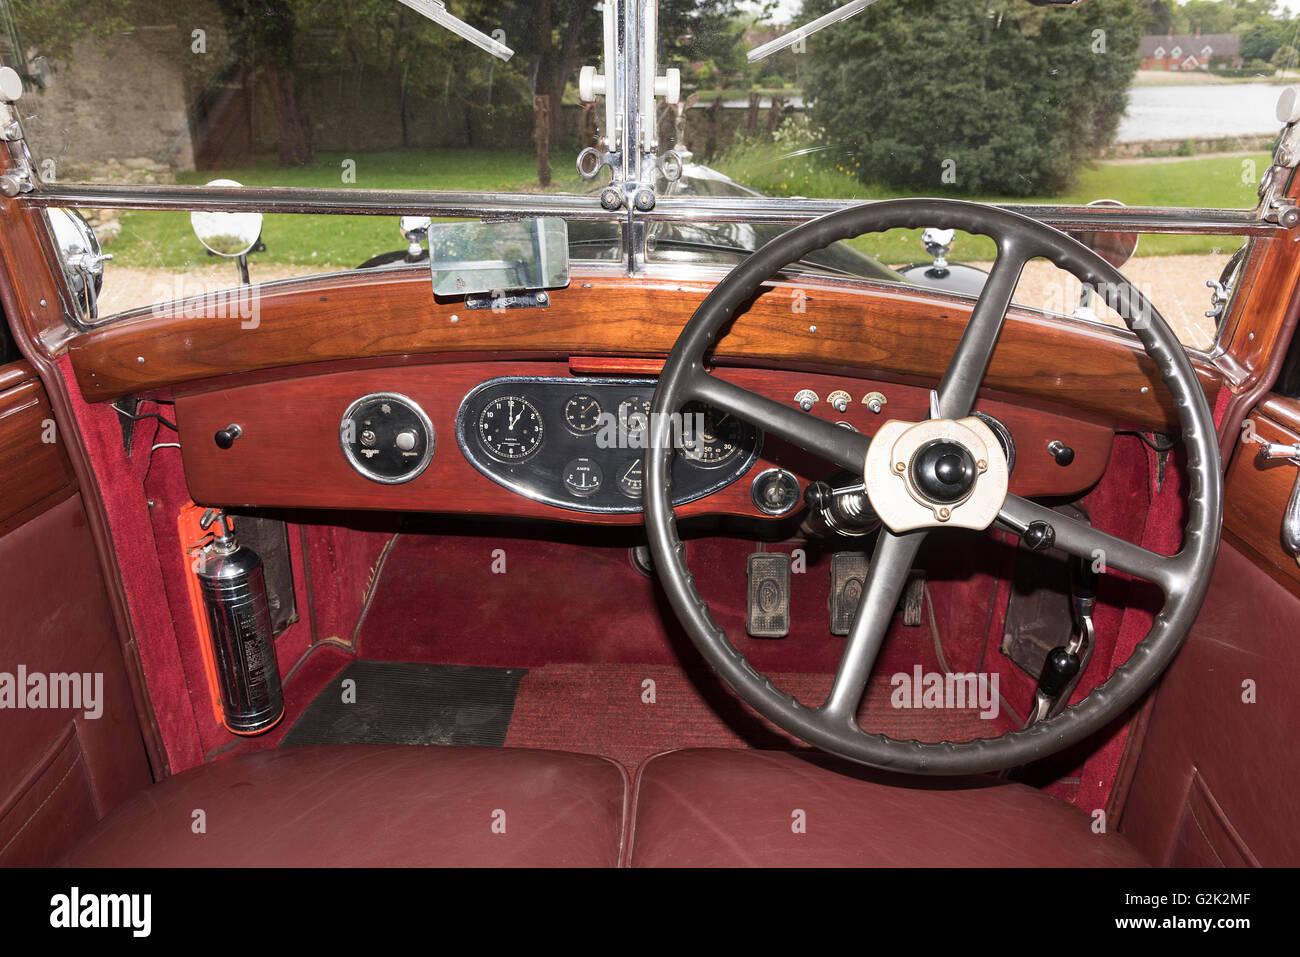 rolls royce phantom interior. 1933 Rolls Royce Phantom II Sedanca De Ville Interior - Stock Image P